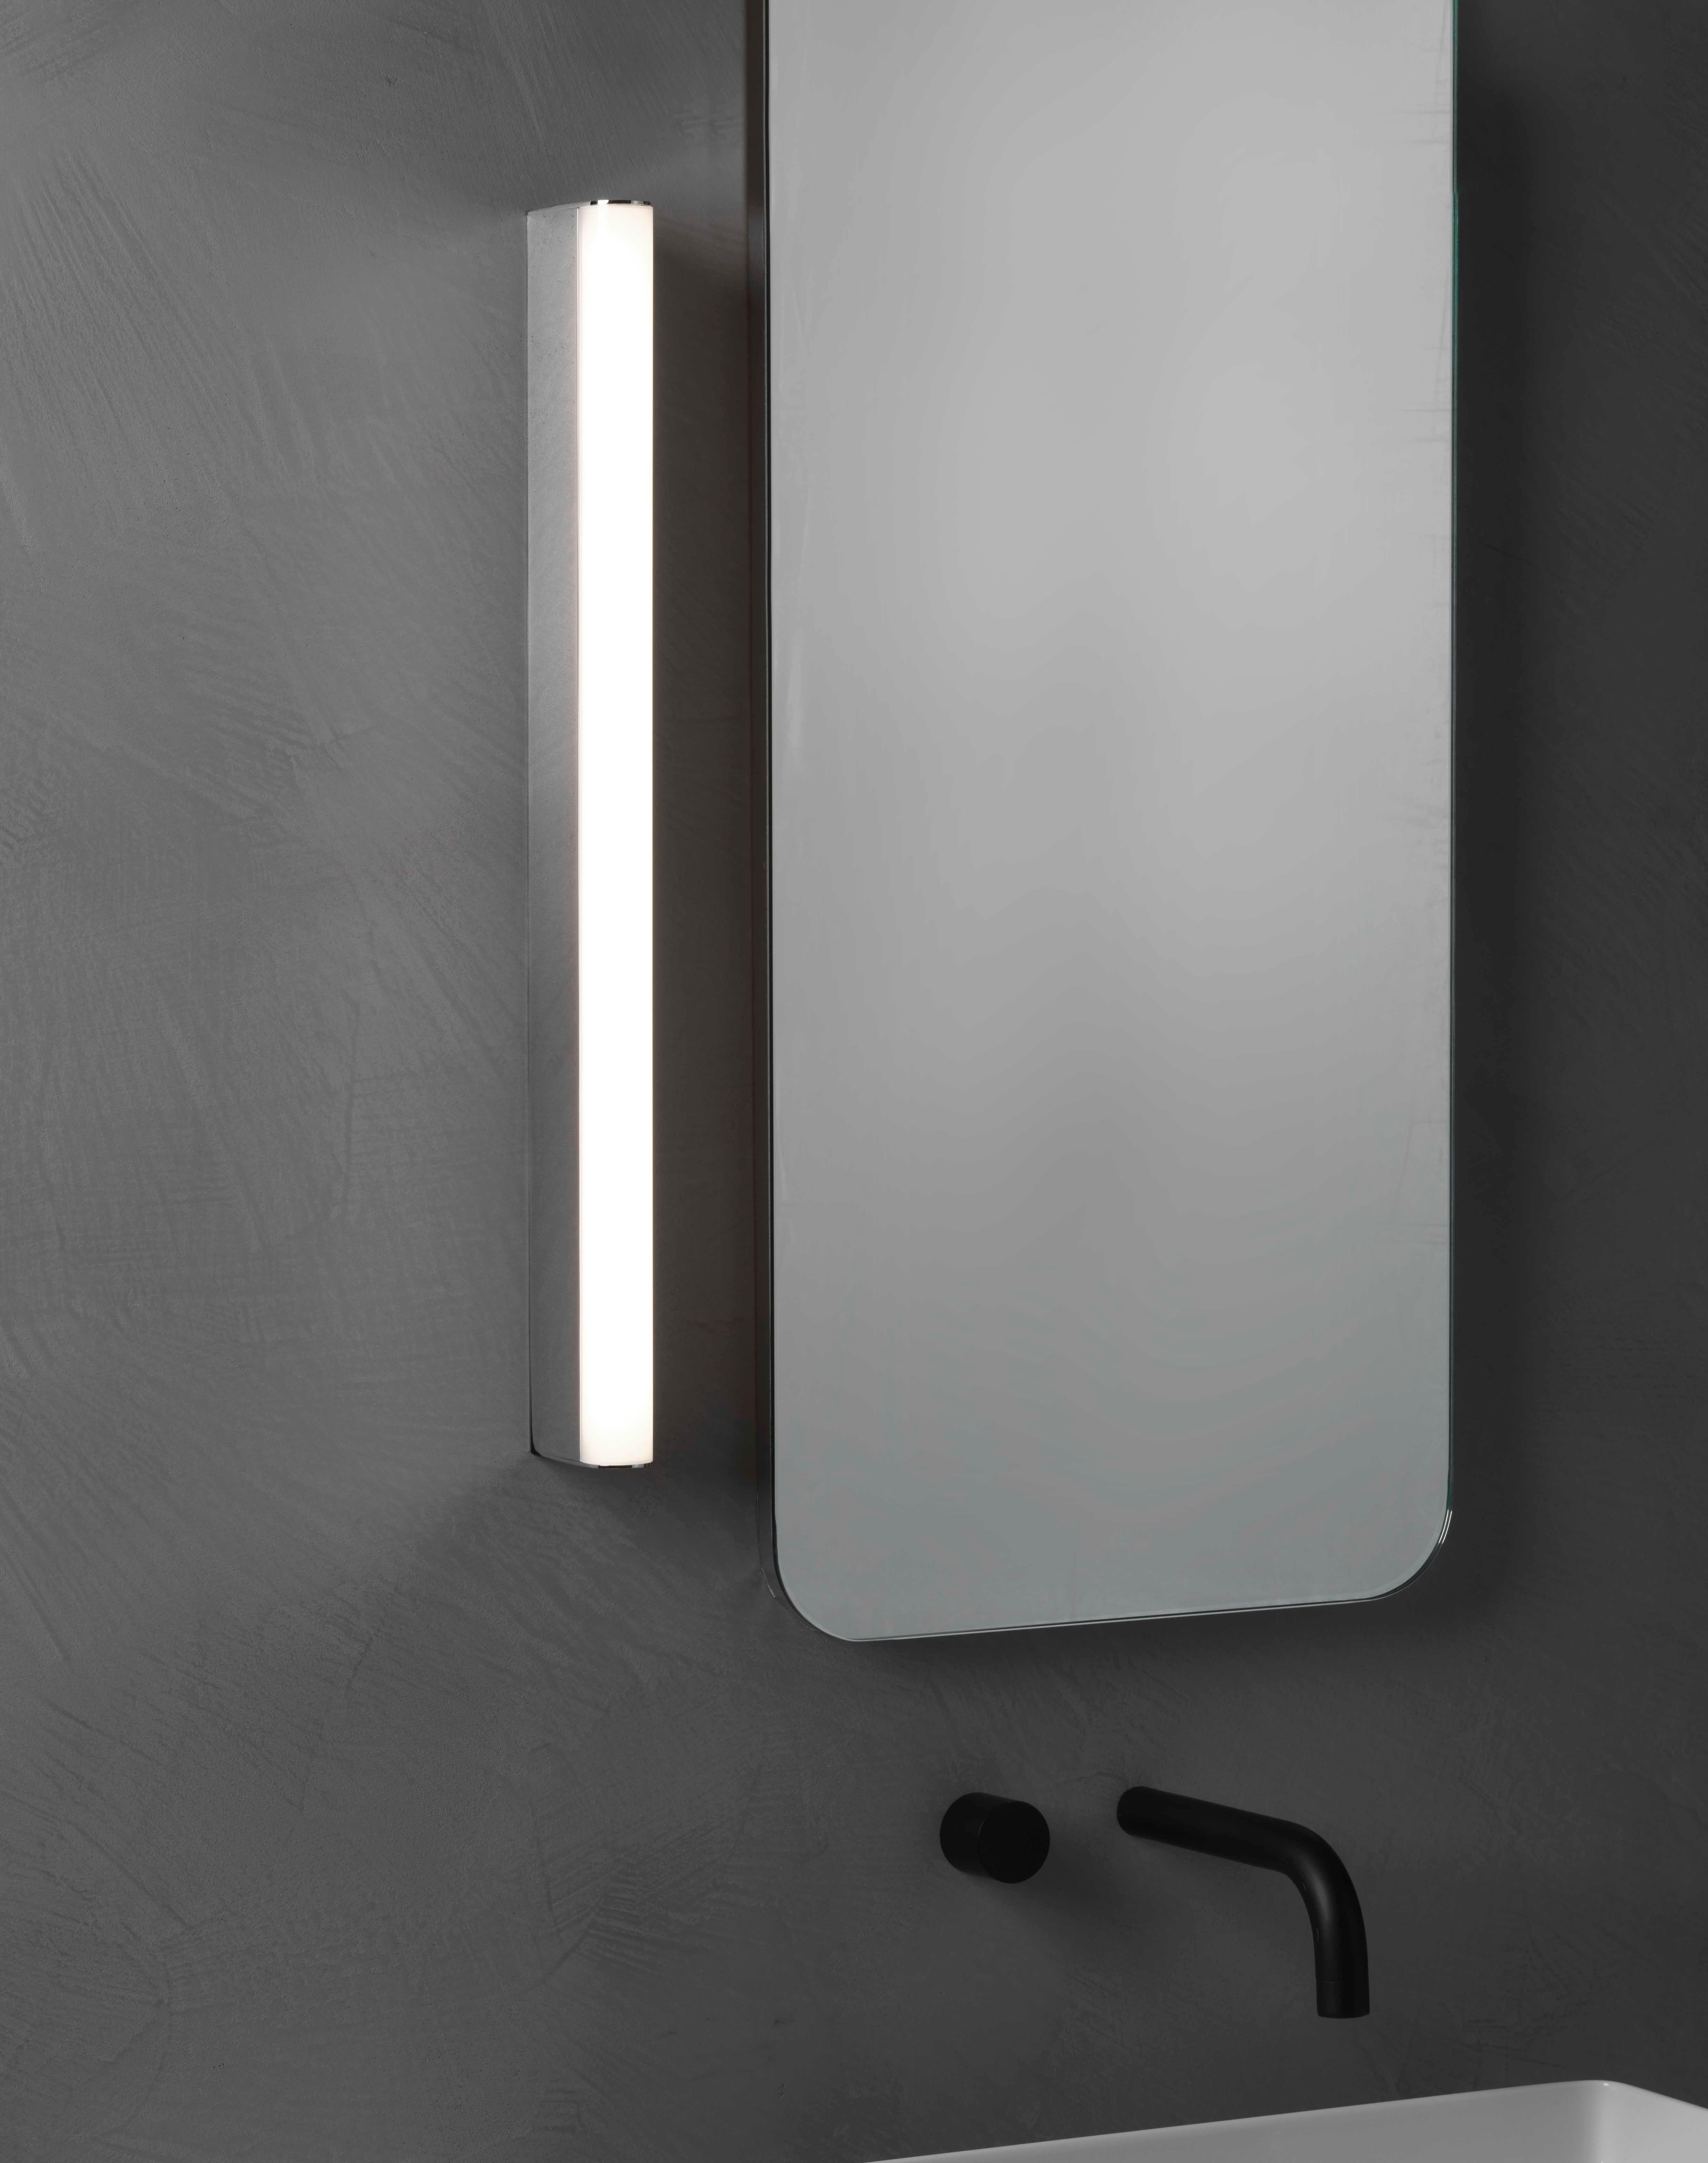 new ideas wall bronze of sconce bathroom design sconces home elegant mirrored